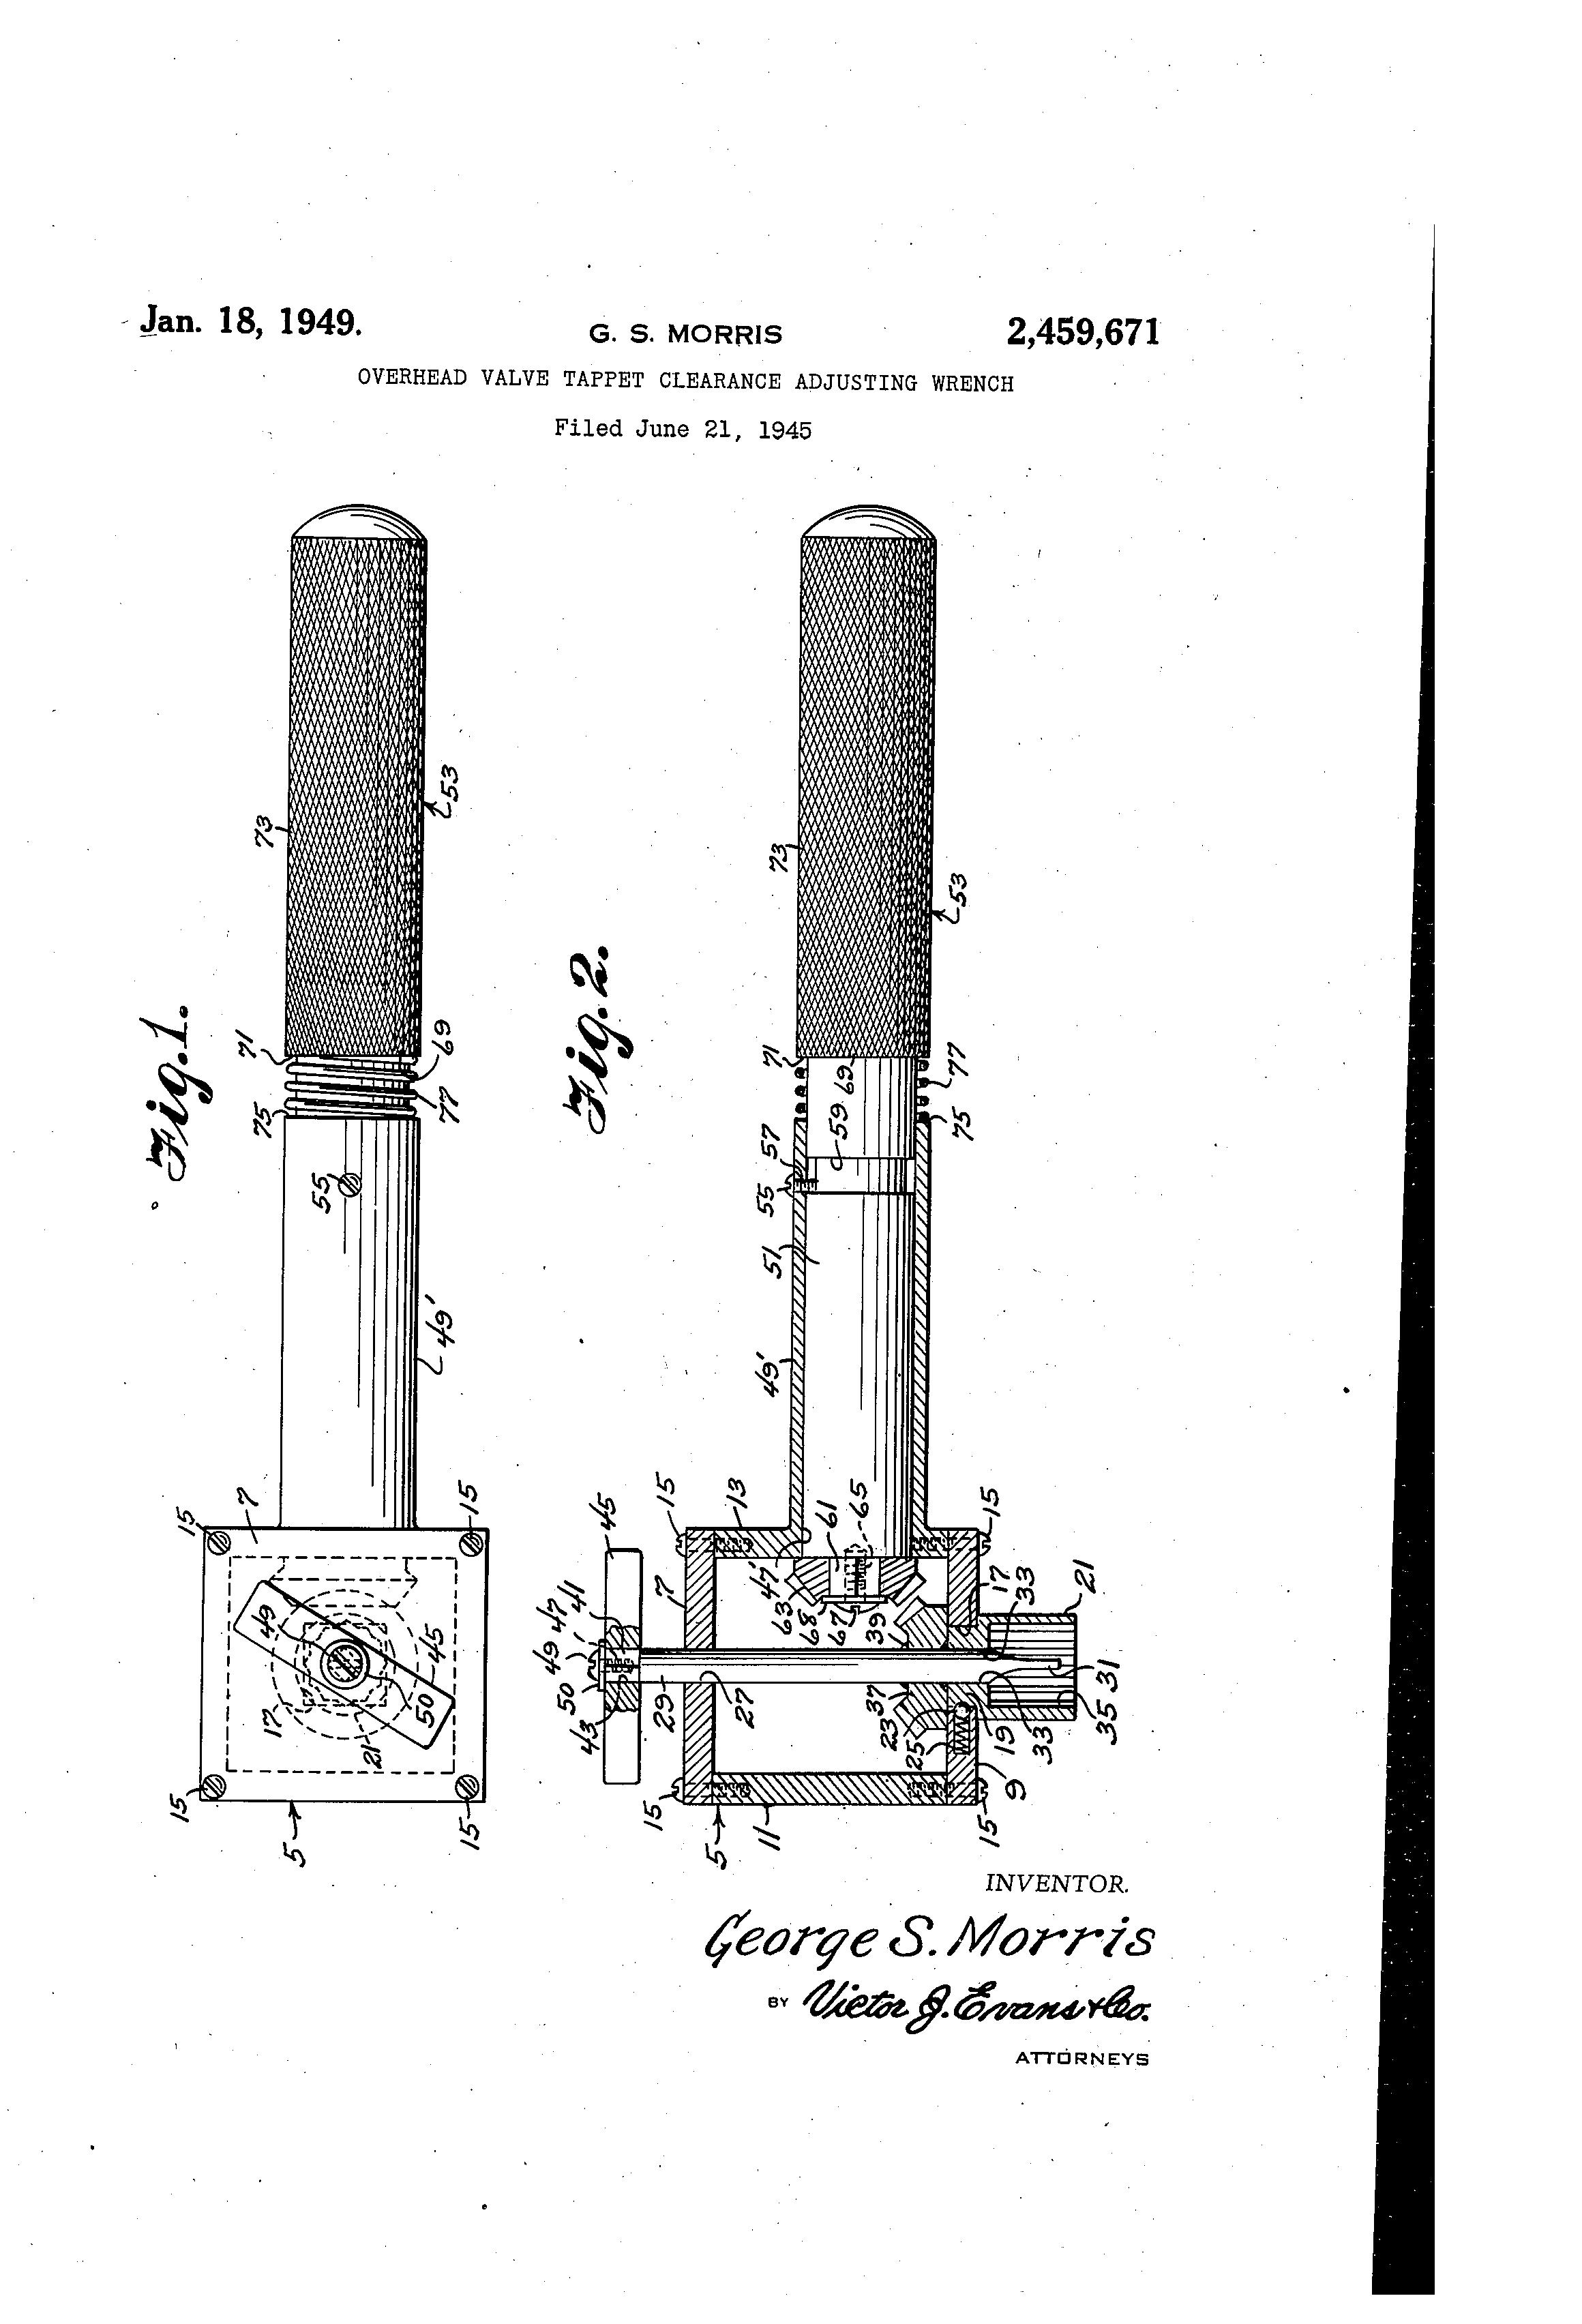 Patent US2459671 - Overhead valve tappet clearance adjusting